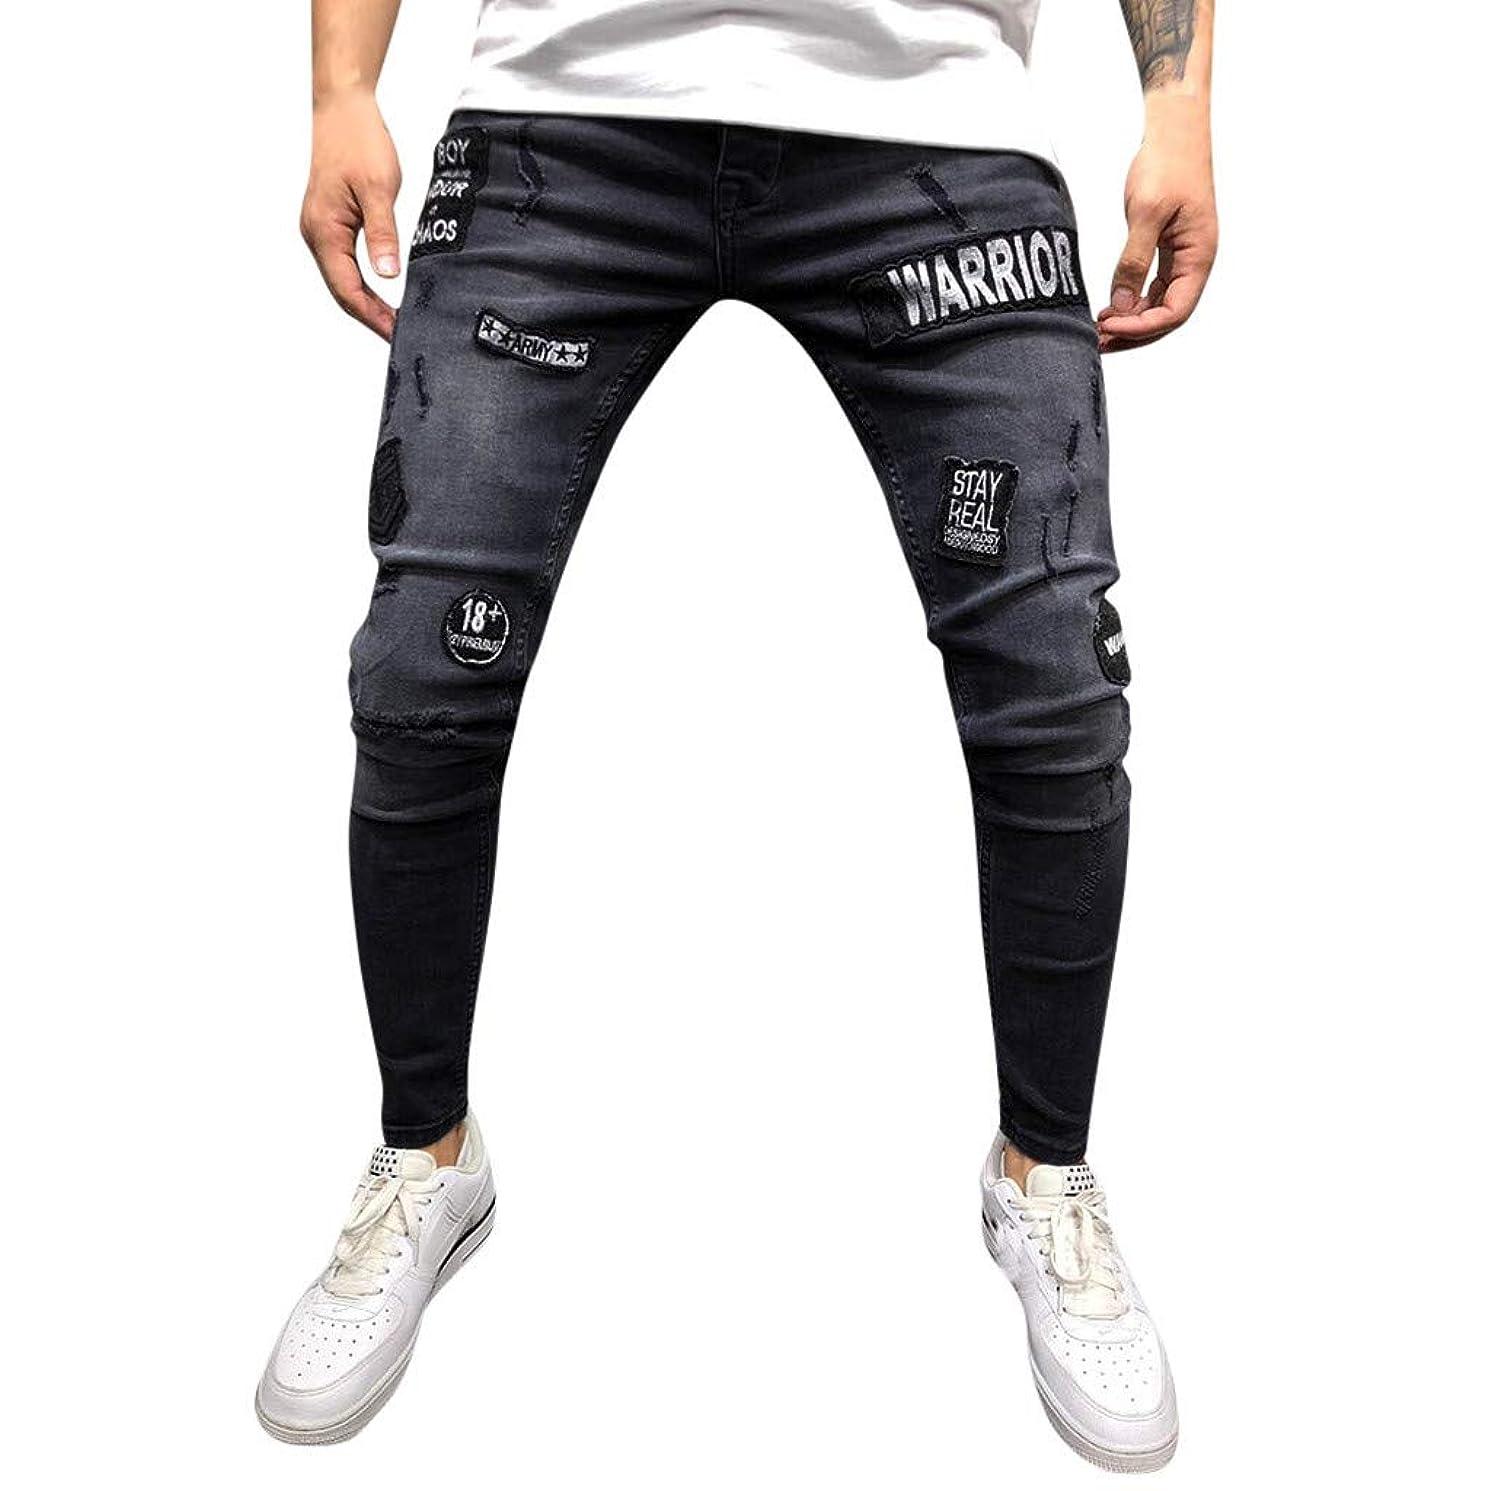 Caopixx Men Casual Trouser Biker Ripped Skinny Jeans Frayed Slim Fit Denim Pants Mens Shorts